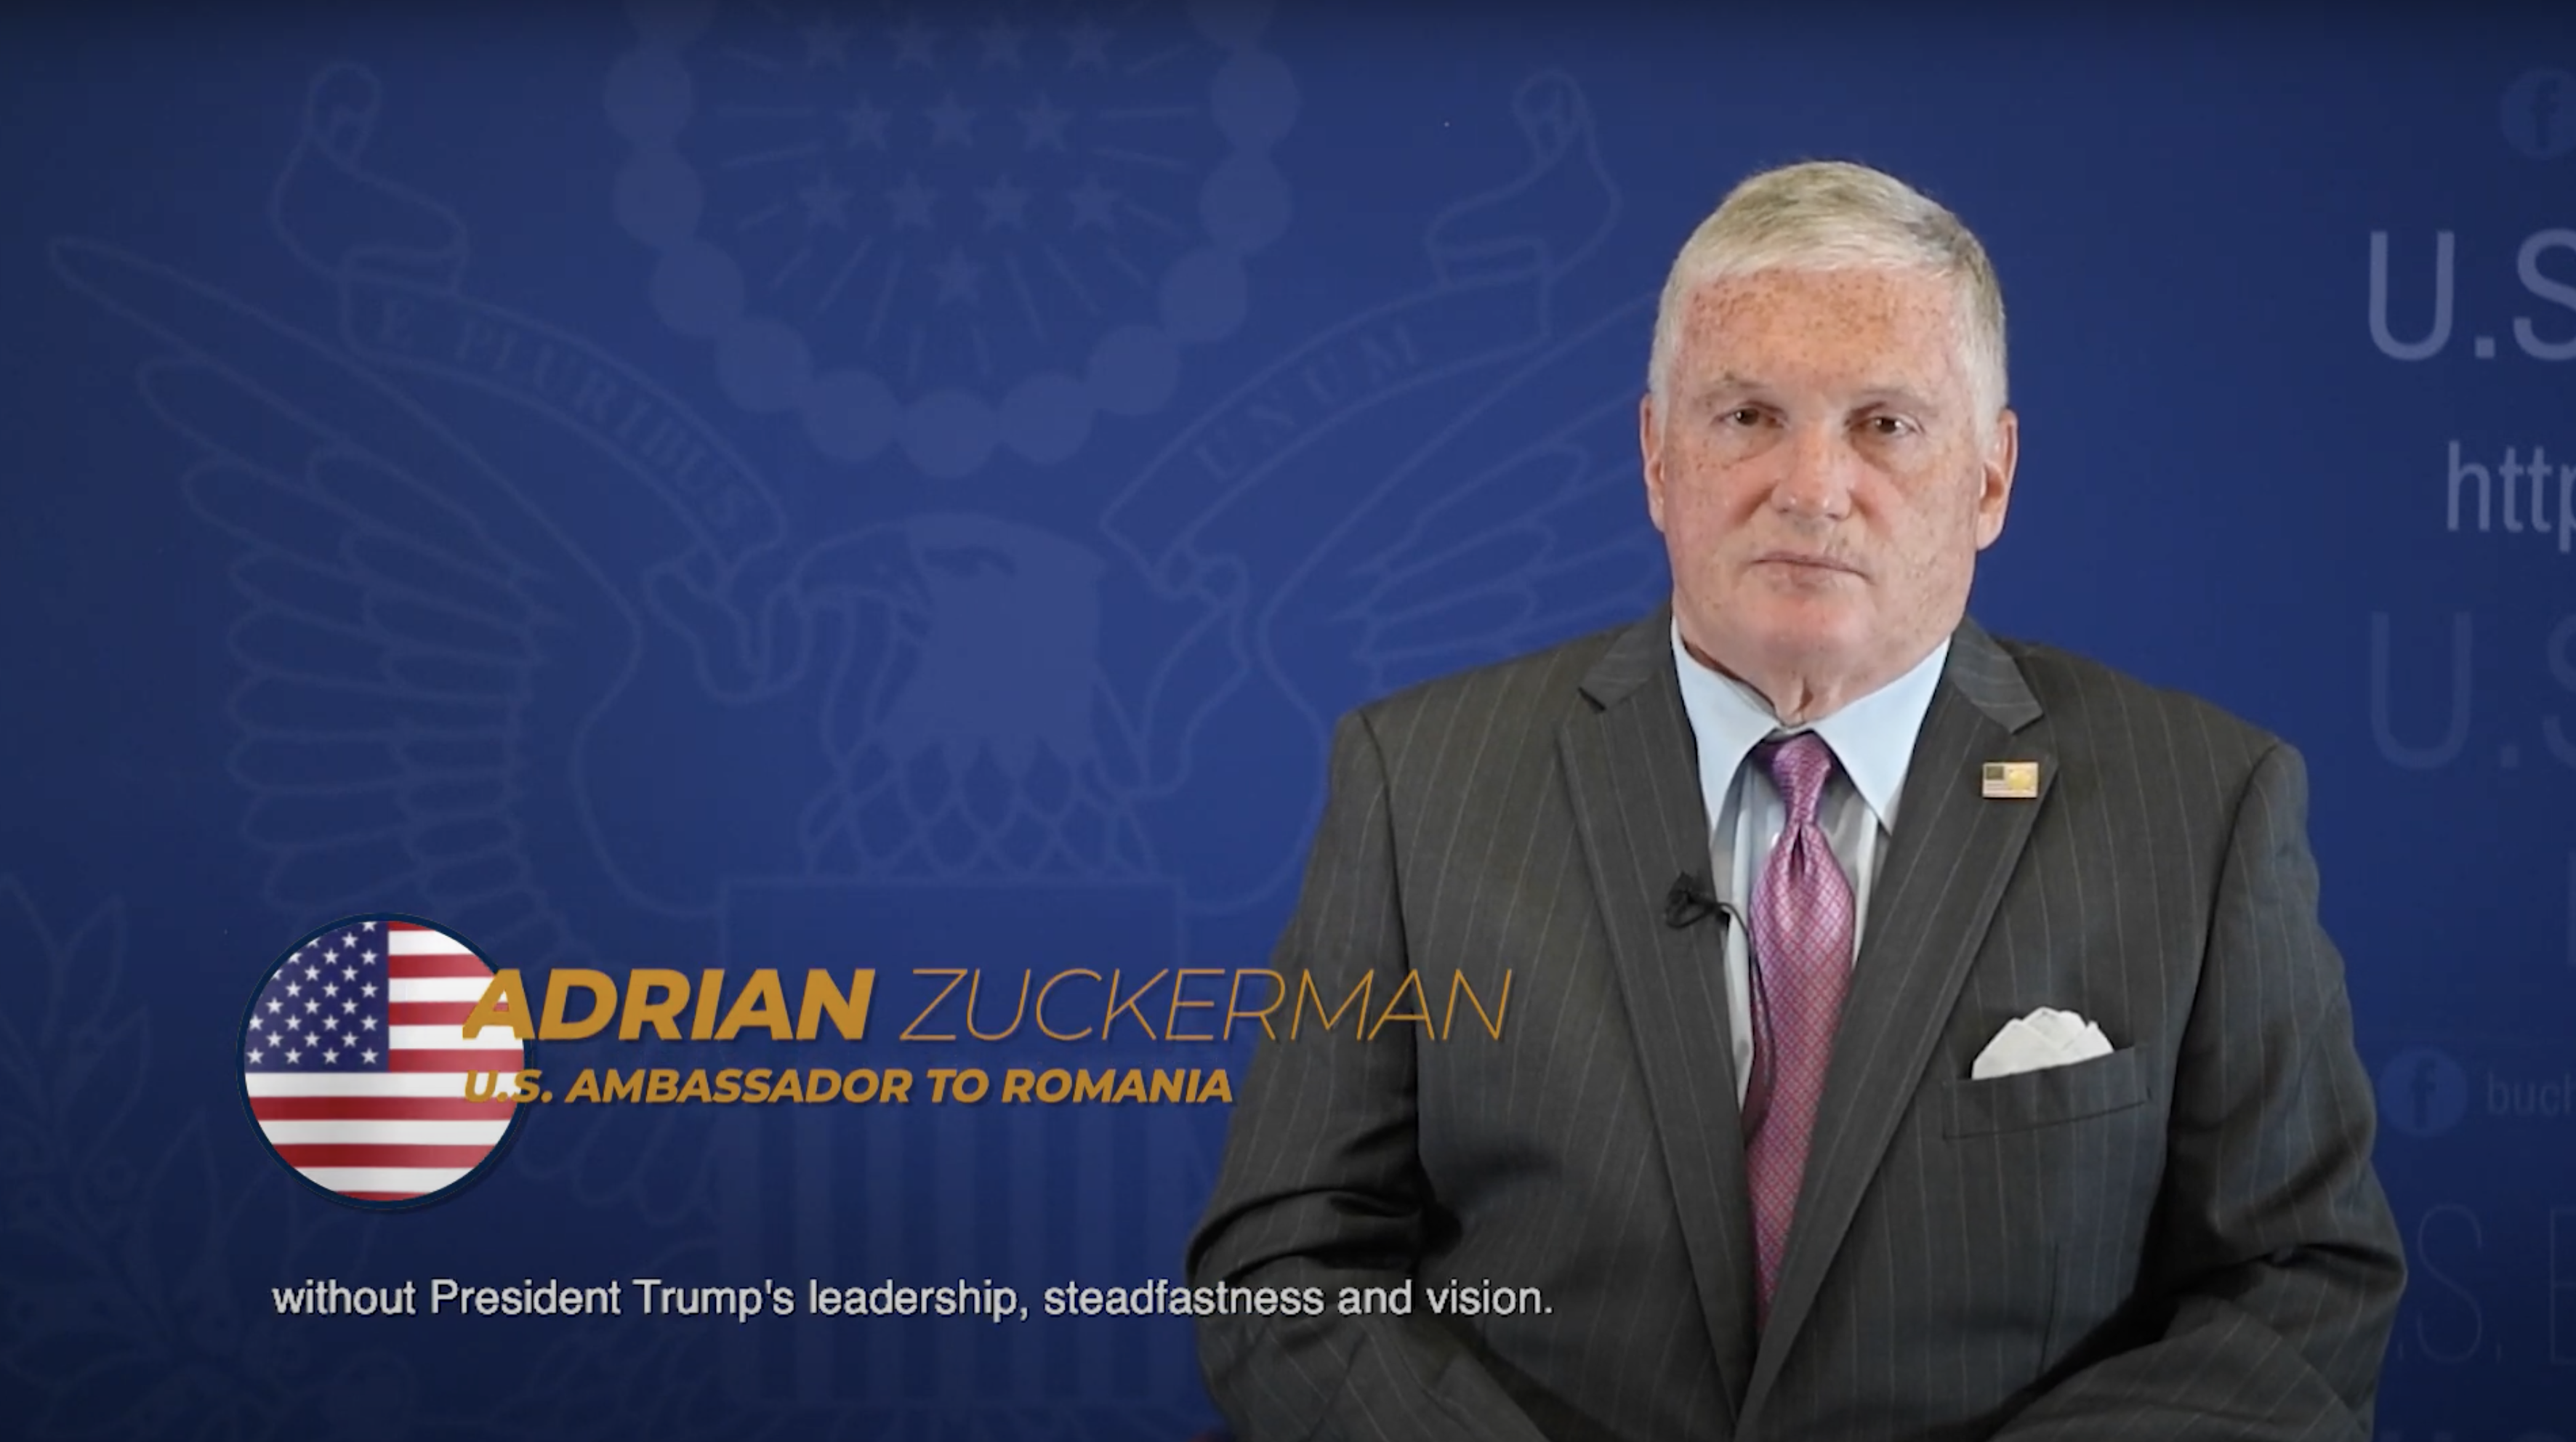 Ambassador Adrian Zuckerman Addresses Aspen Institute's Bucharest Forum  (Video) | U.S. Embassy in Romania